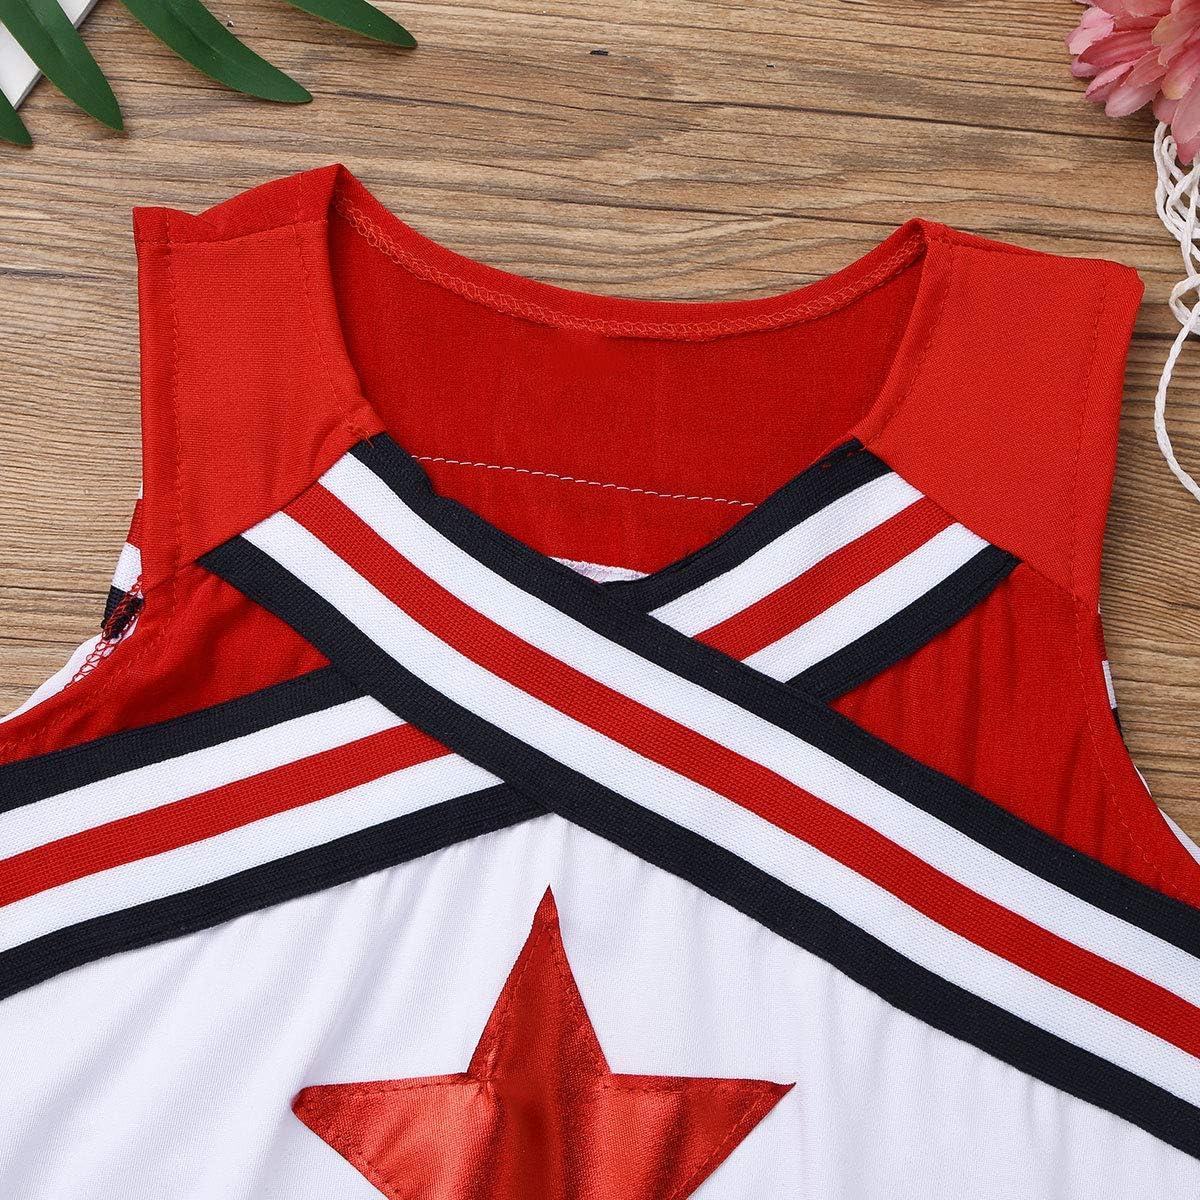 dPois Disfraces de Animadora Fútbol Tenis Baloncesto Niñas Chicas ...